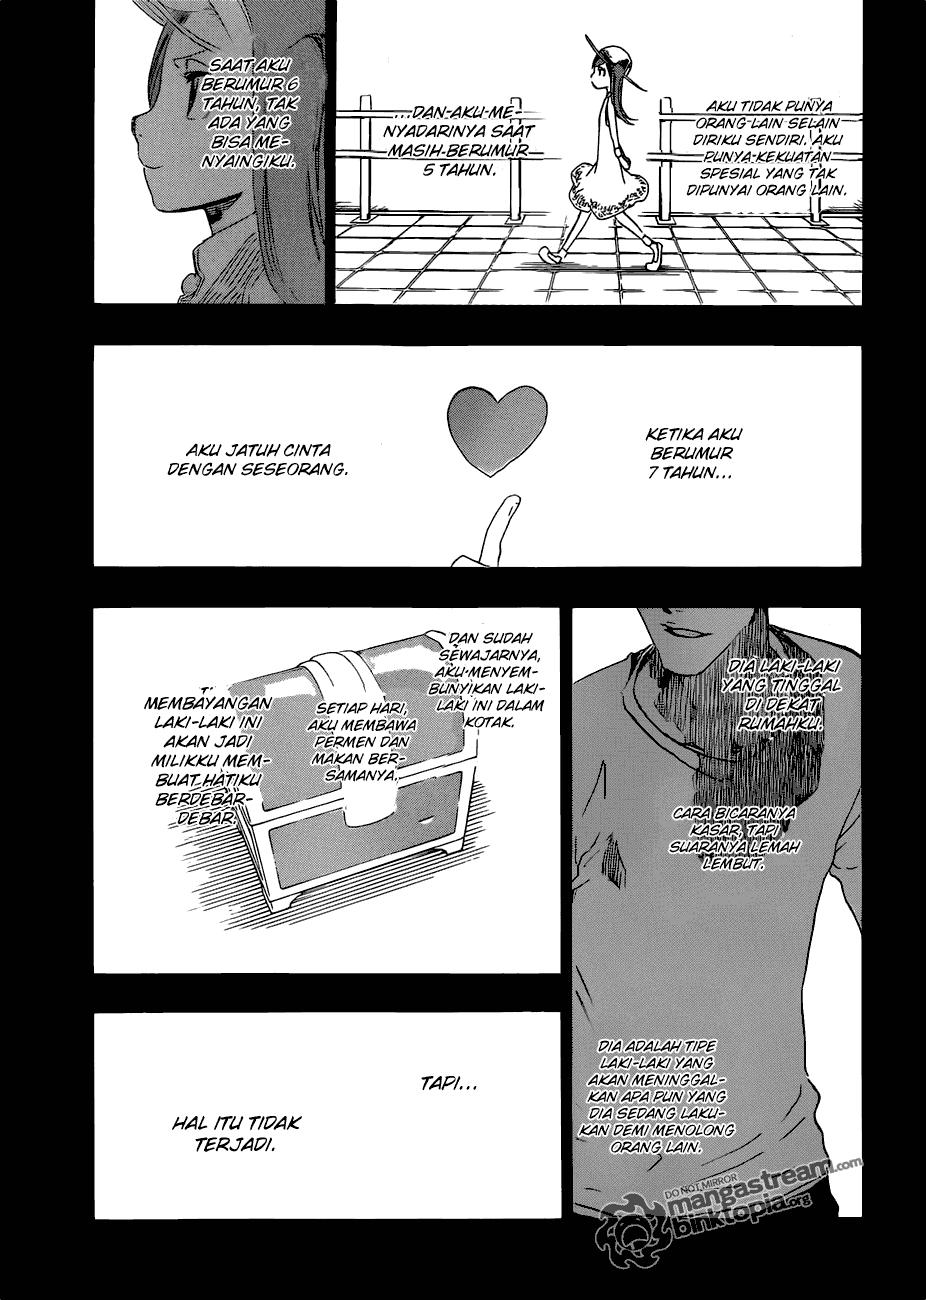 bleach Online 471 manga page 10